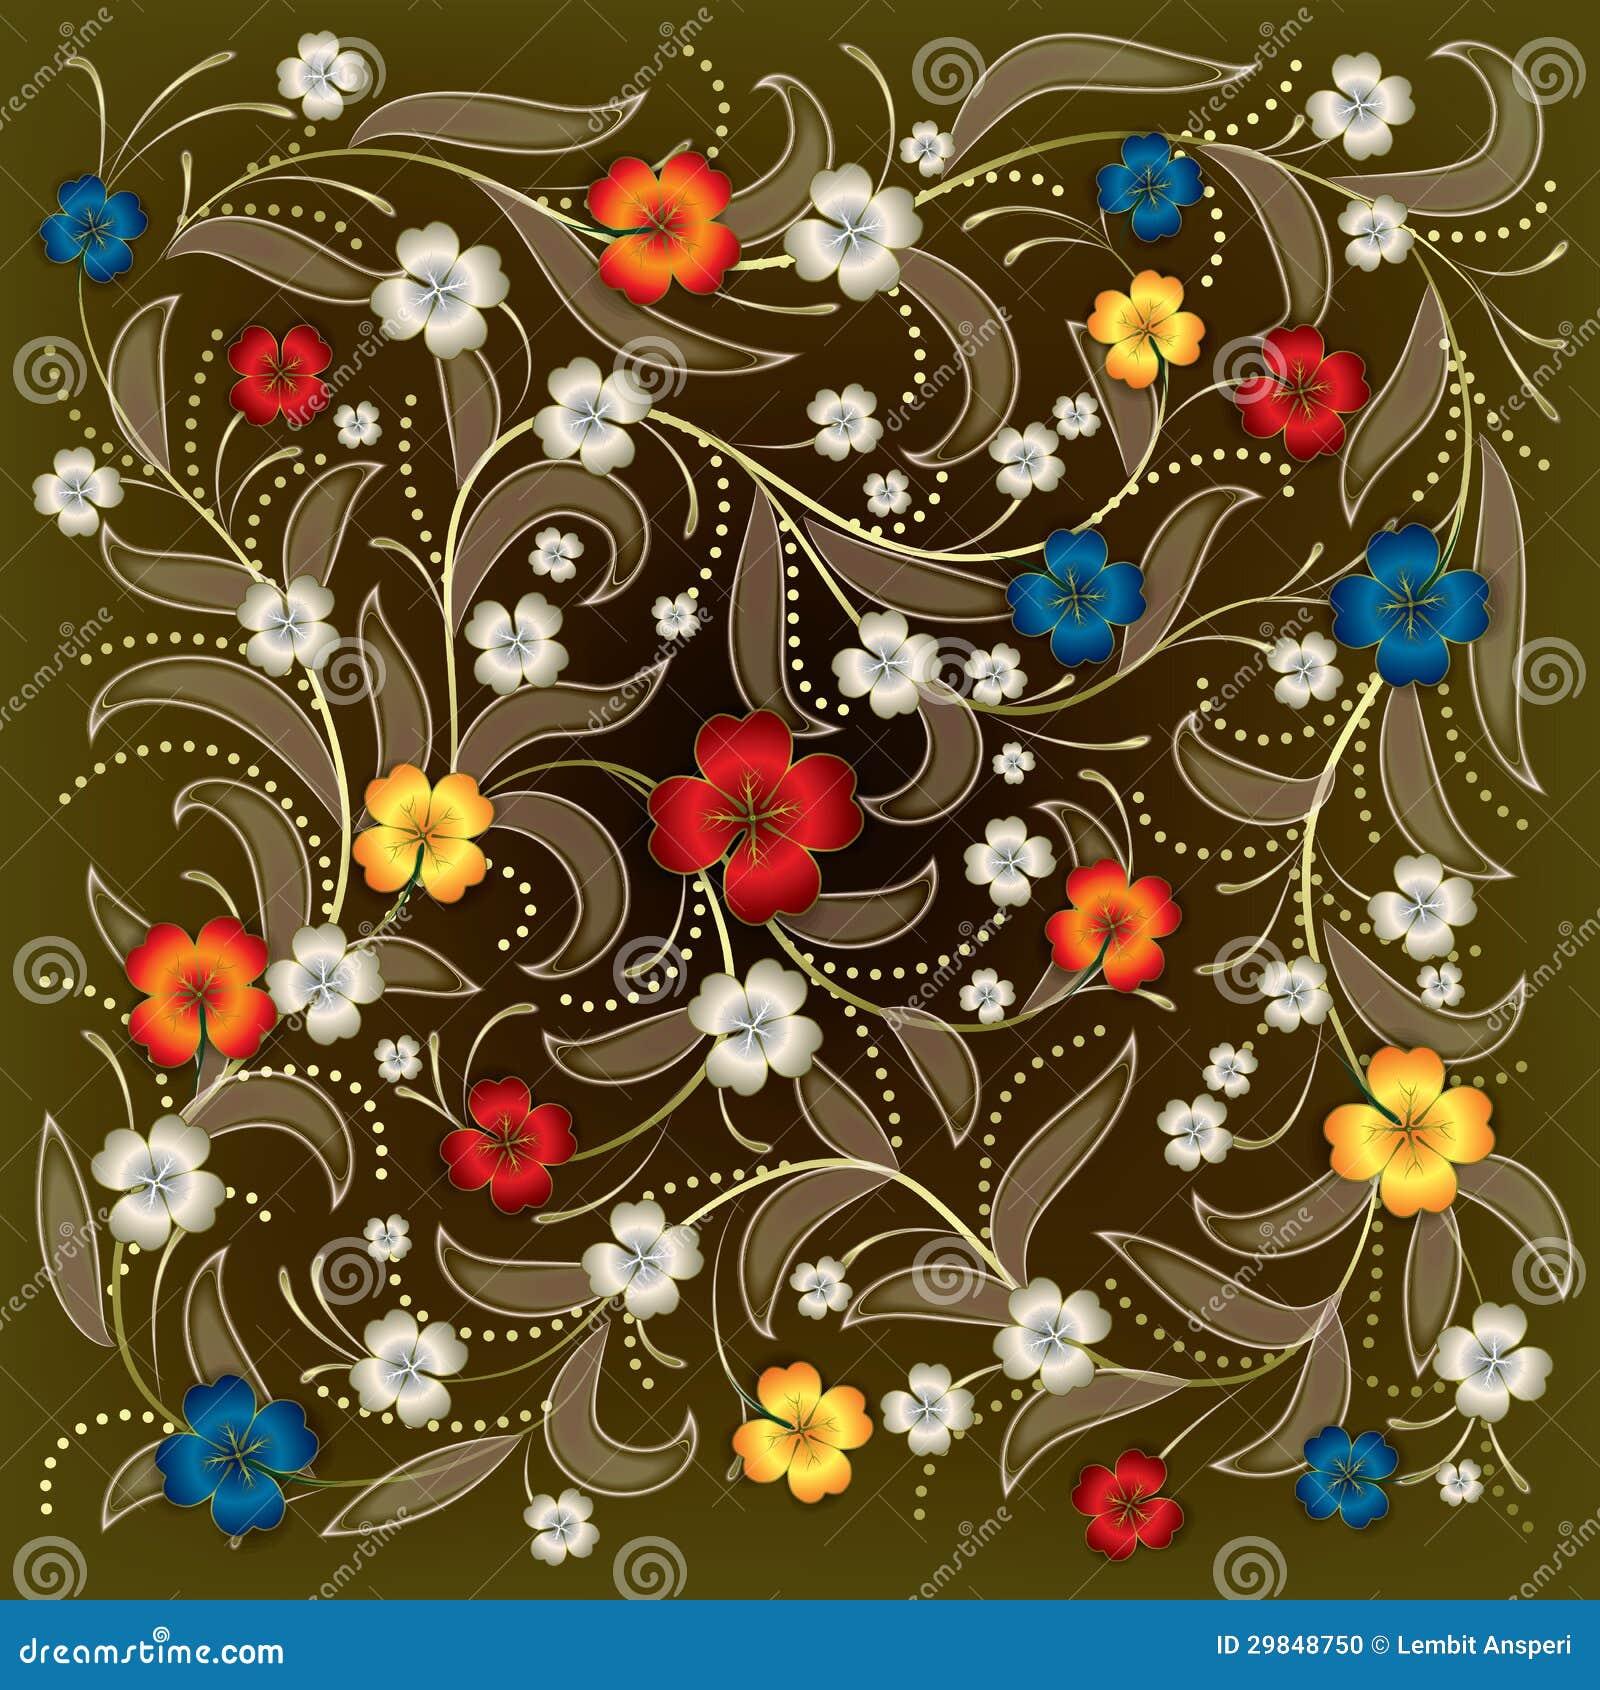 Fundo abstrato com ornamento floral